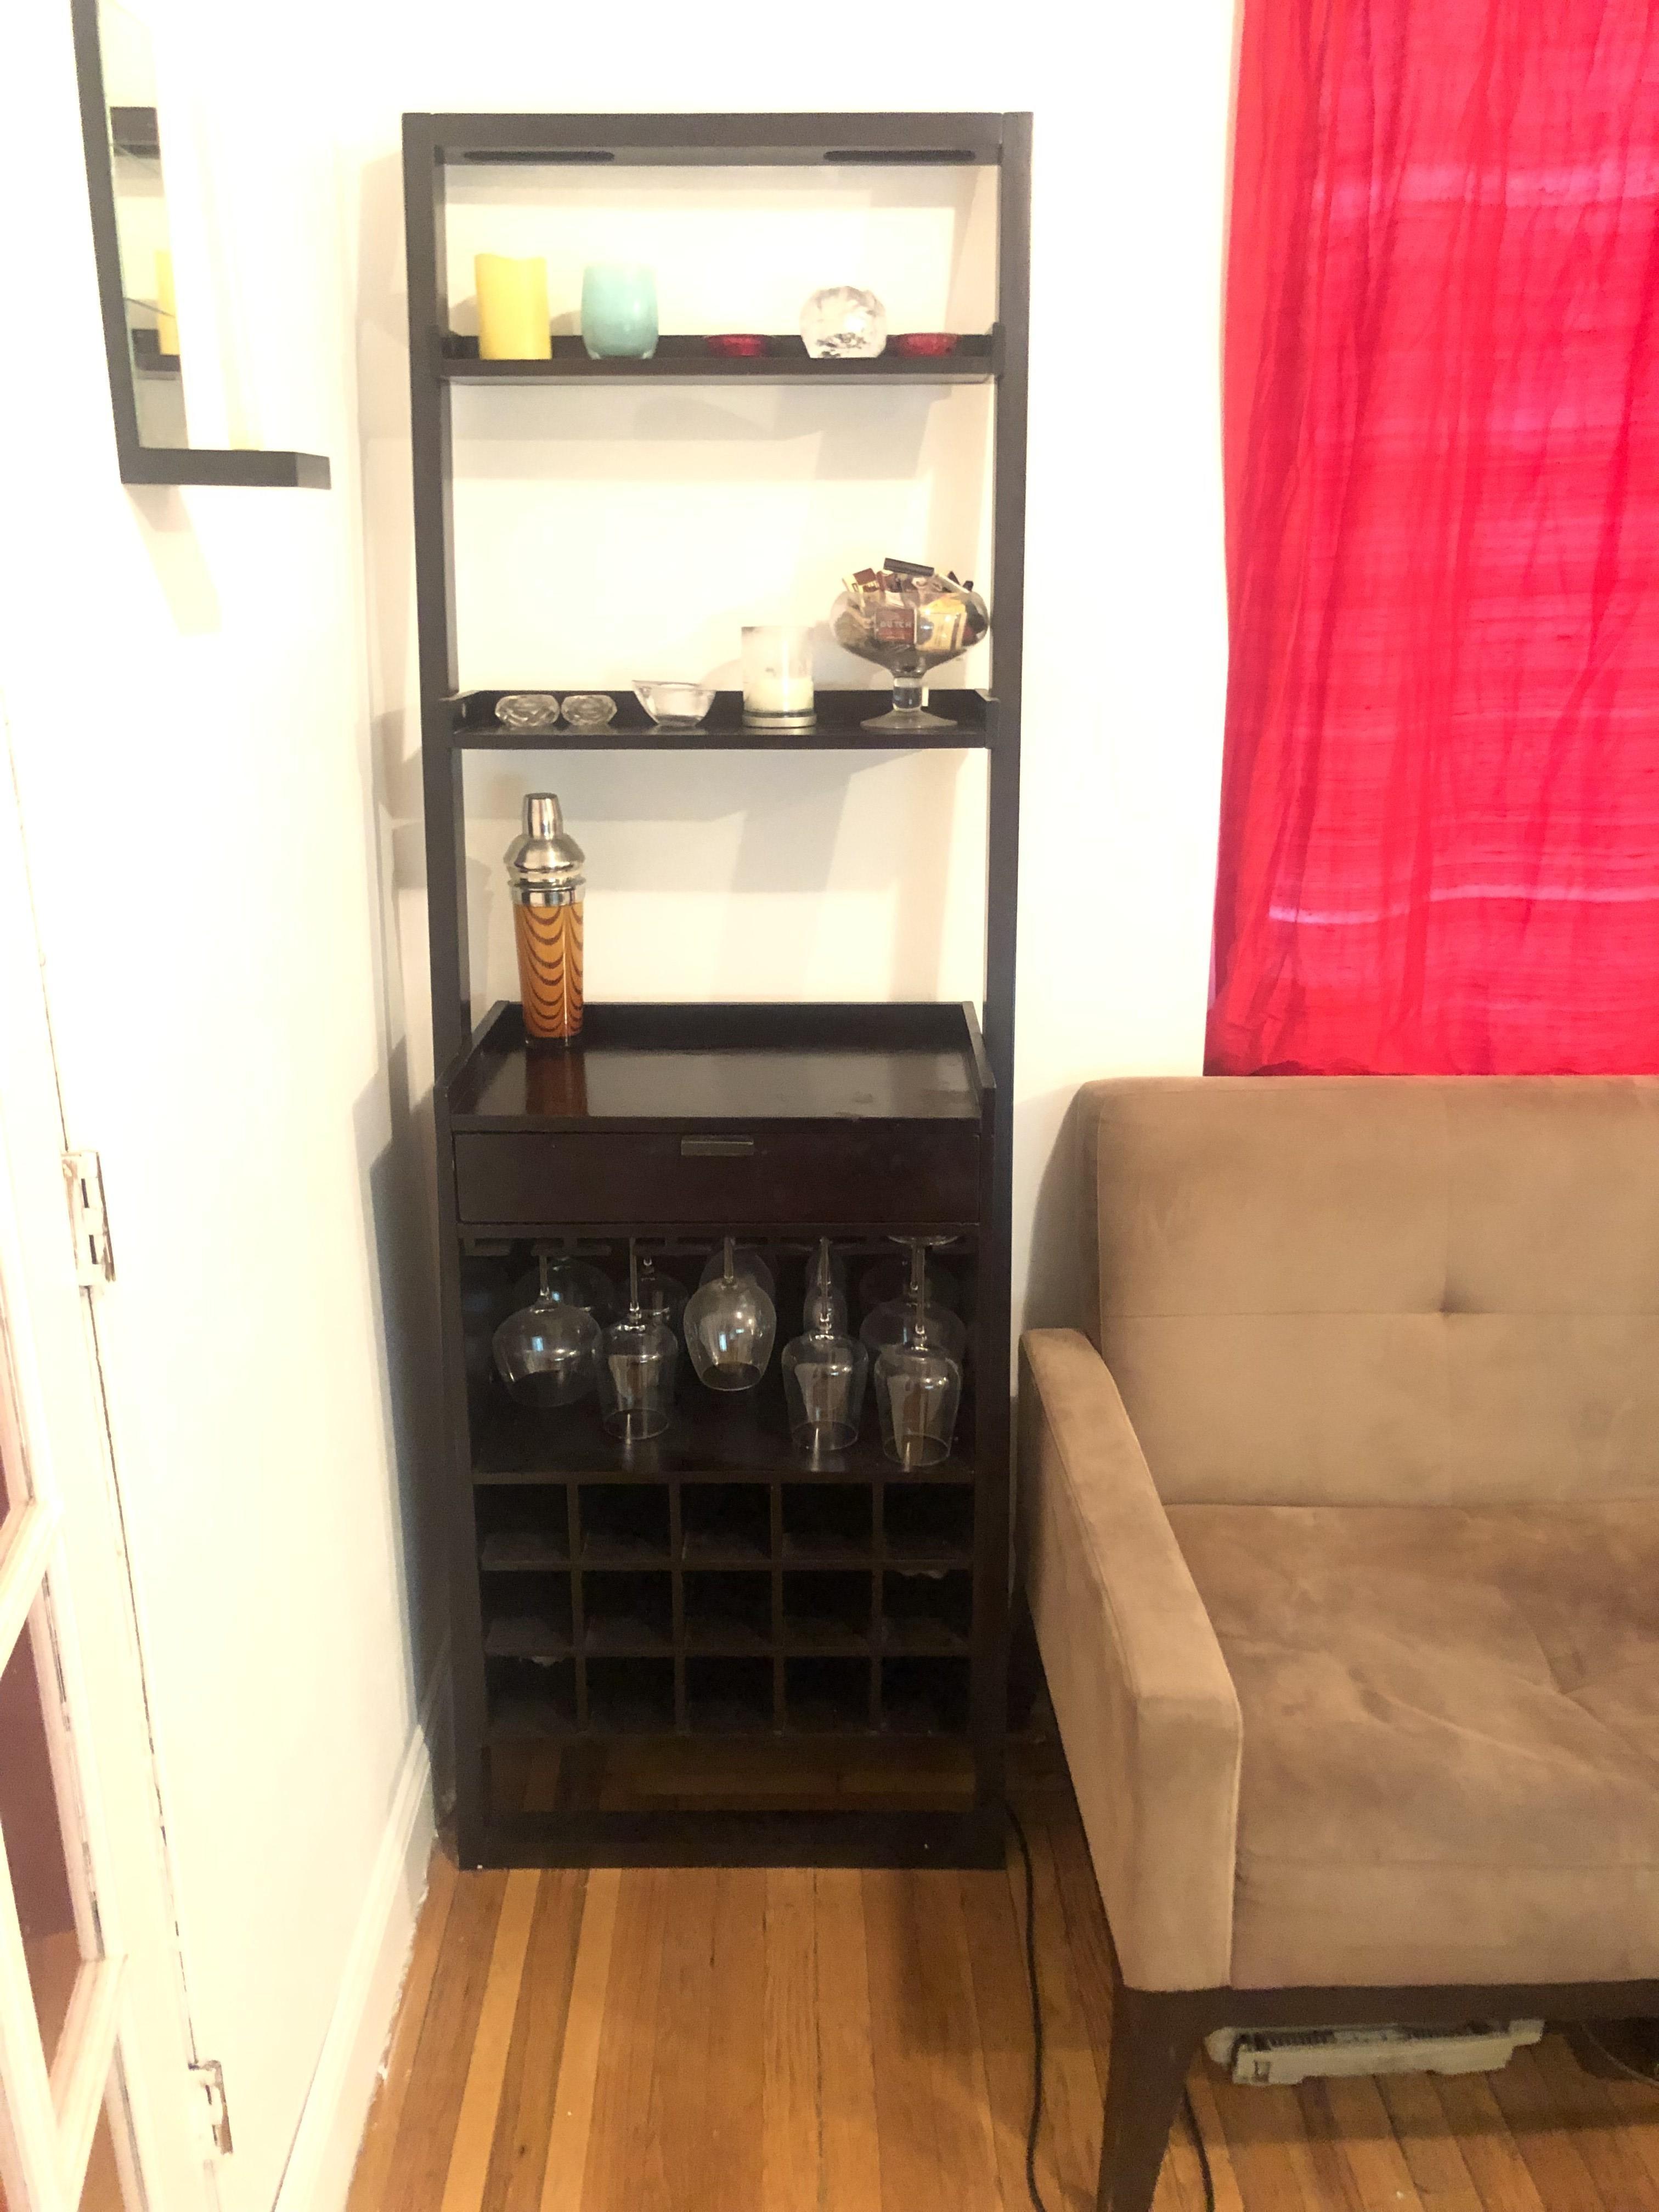 Crate & Barrel Leaning Bar